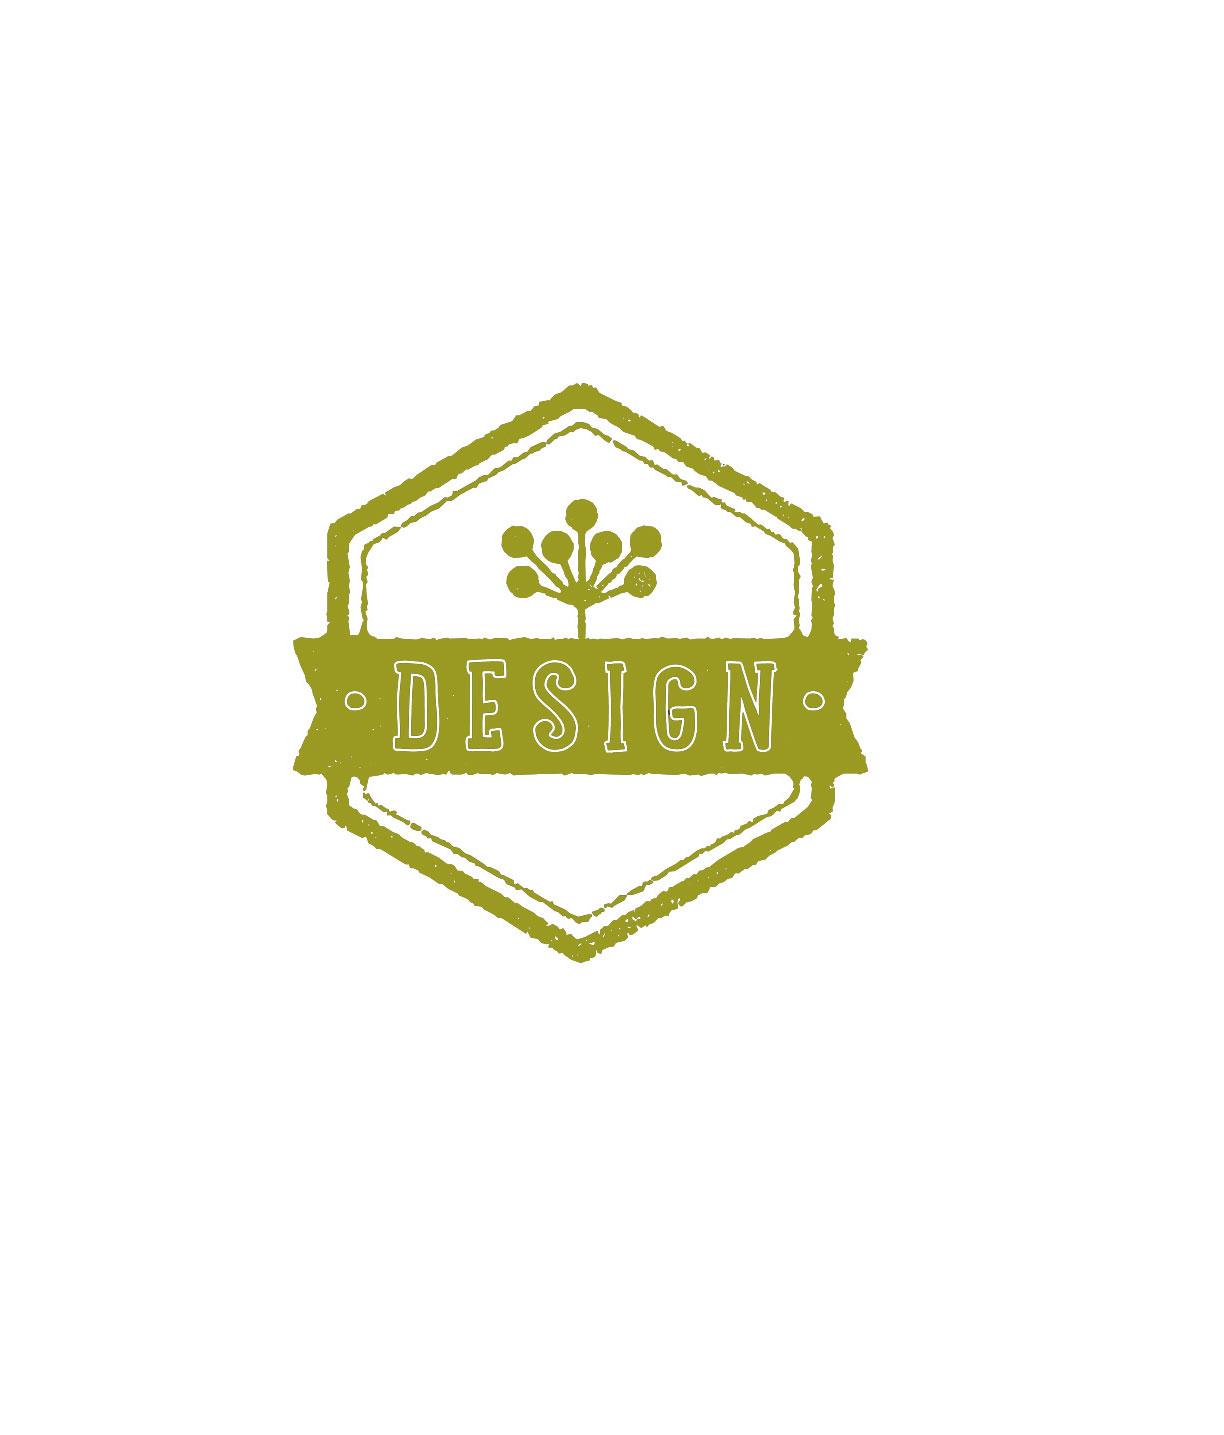 Design-type-treatment-olive-grn-OP.jpg